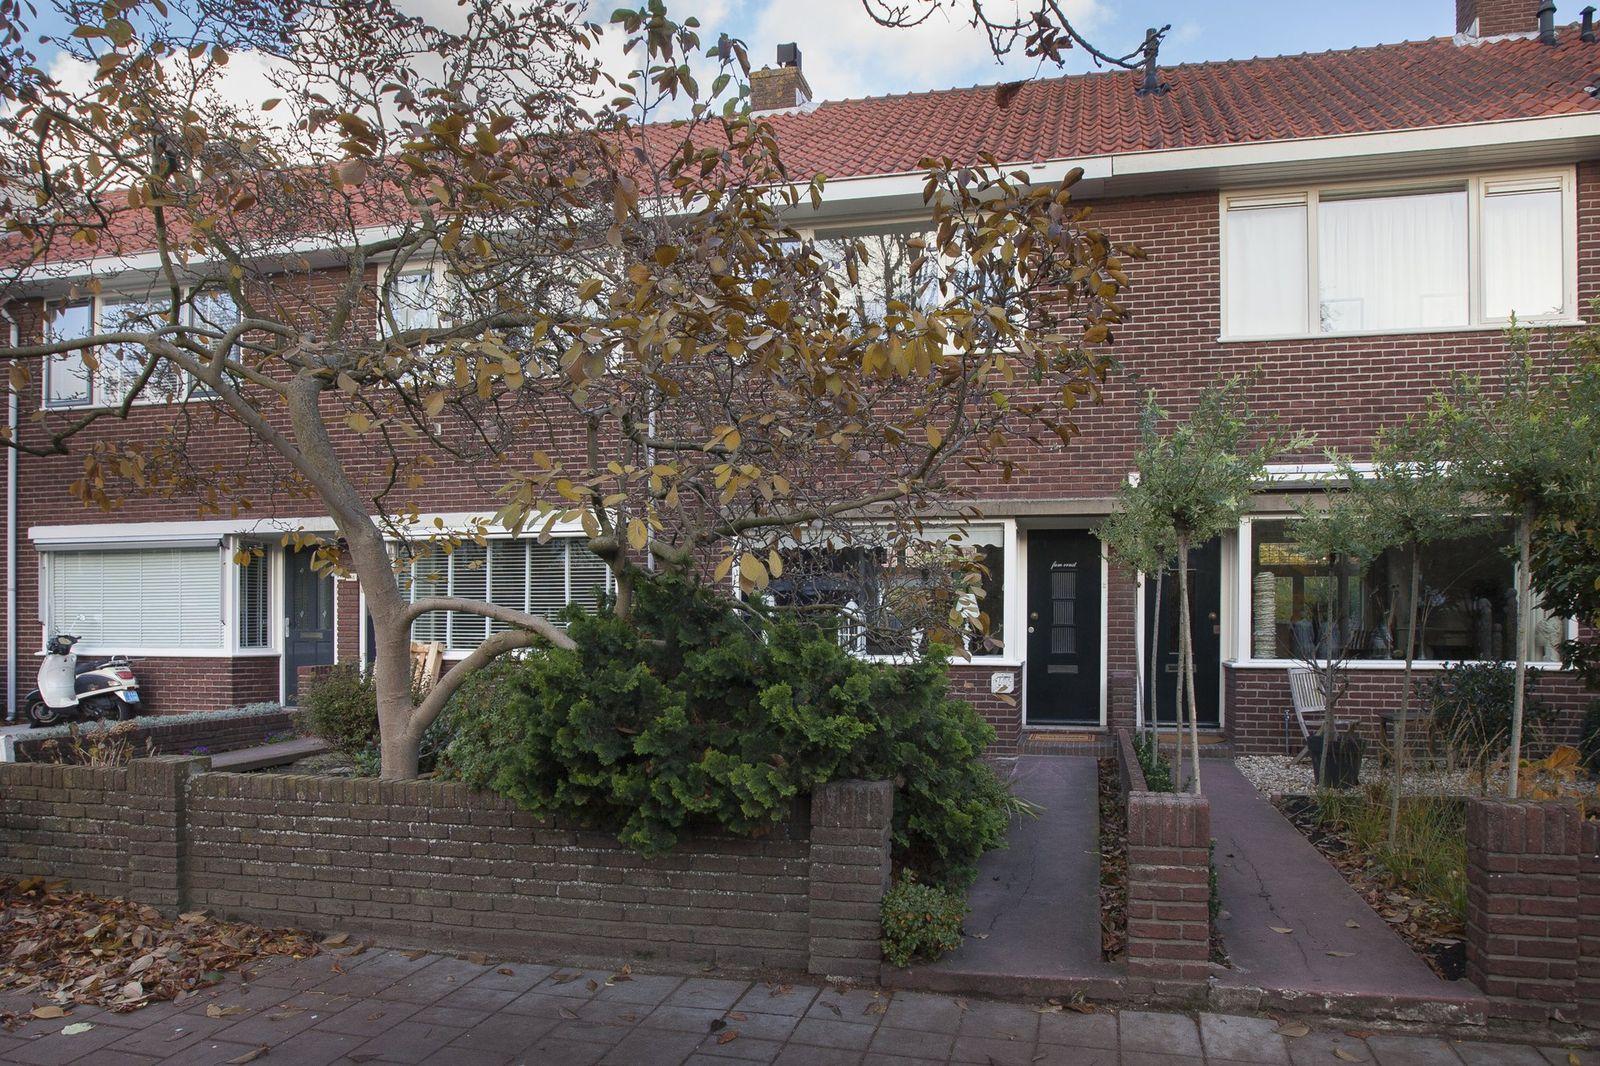 Koningin Wilhelminaweg 144, Gouda